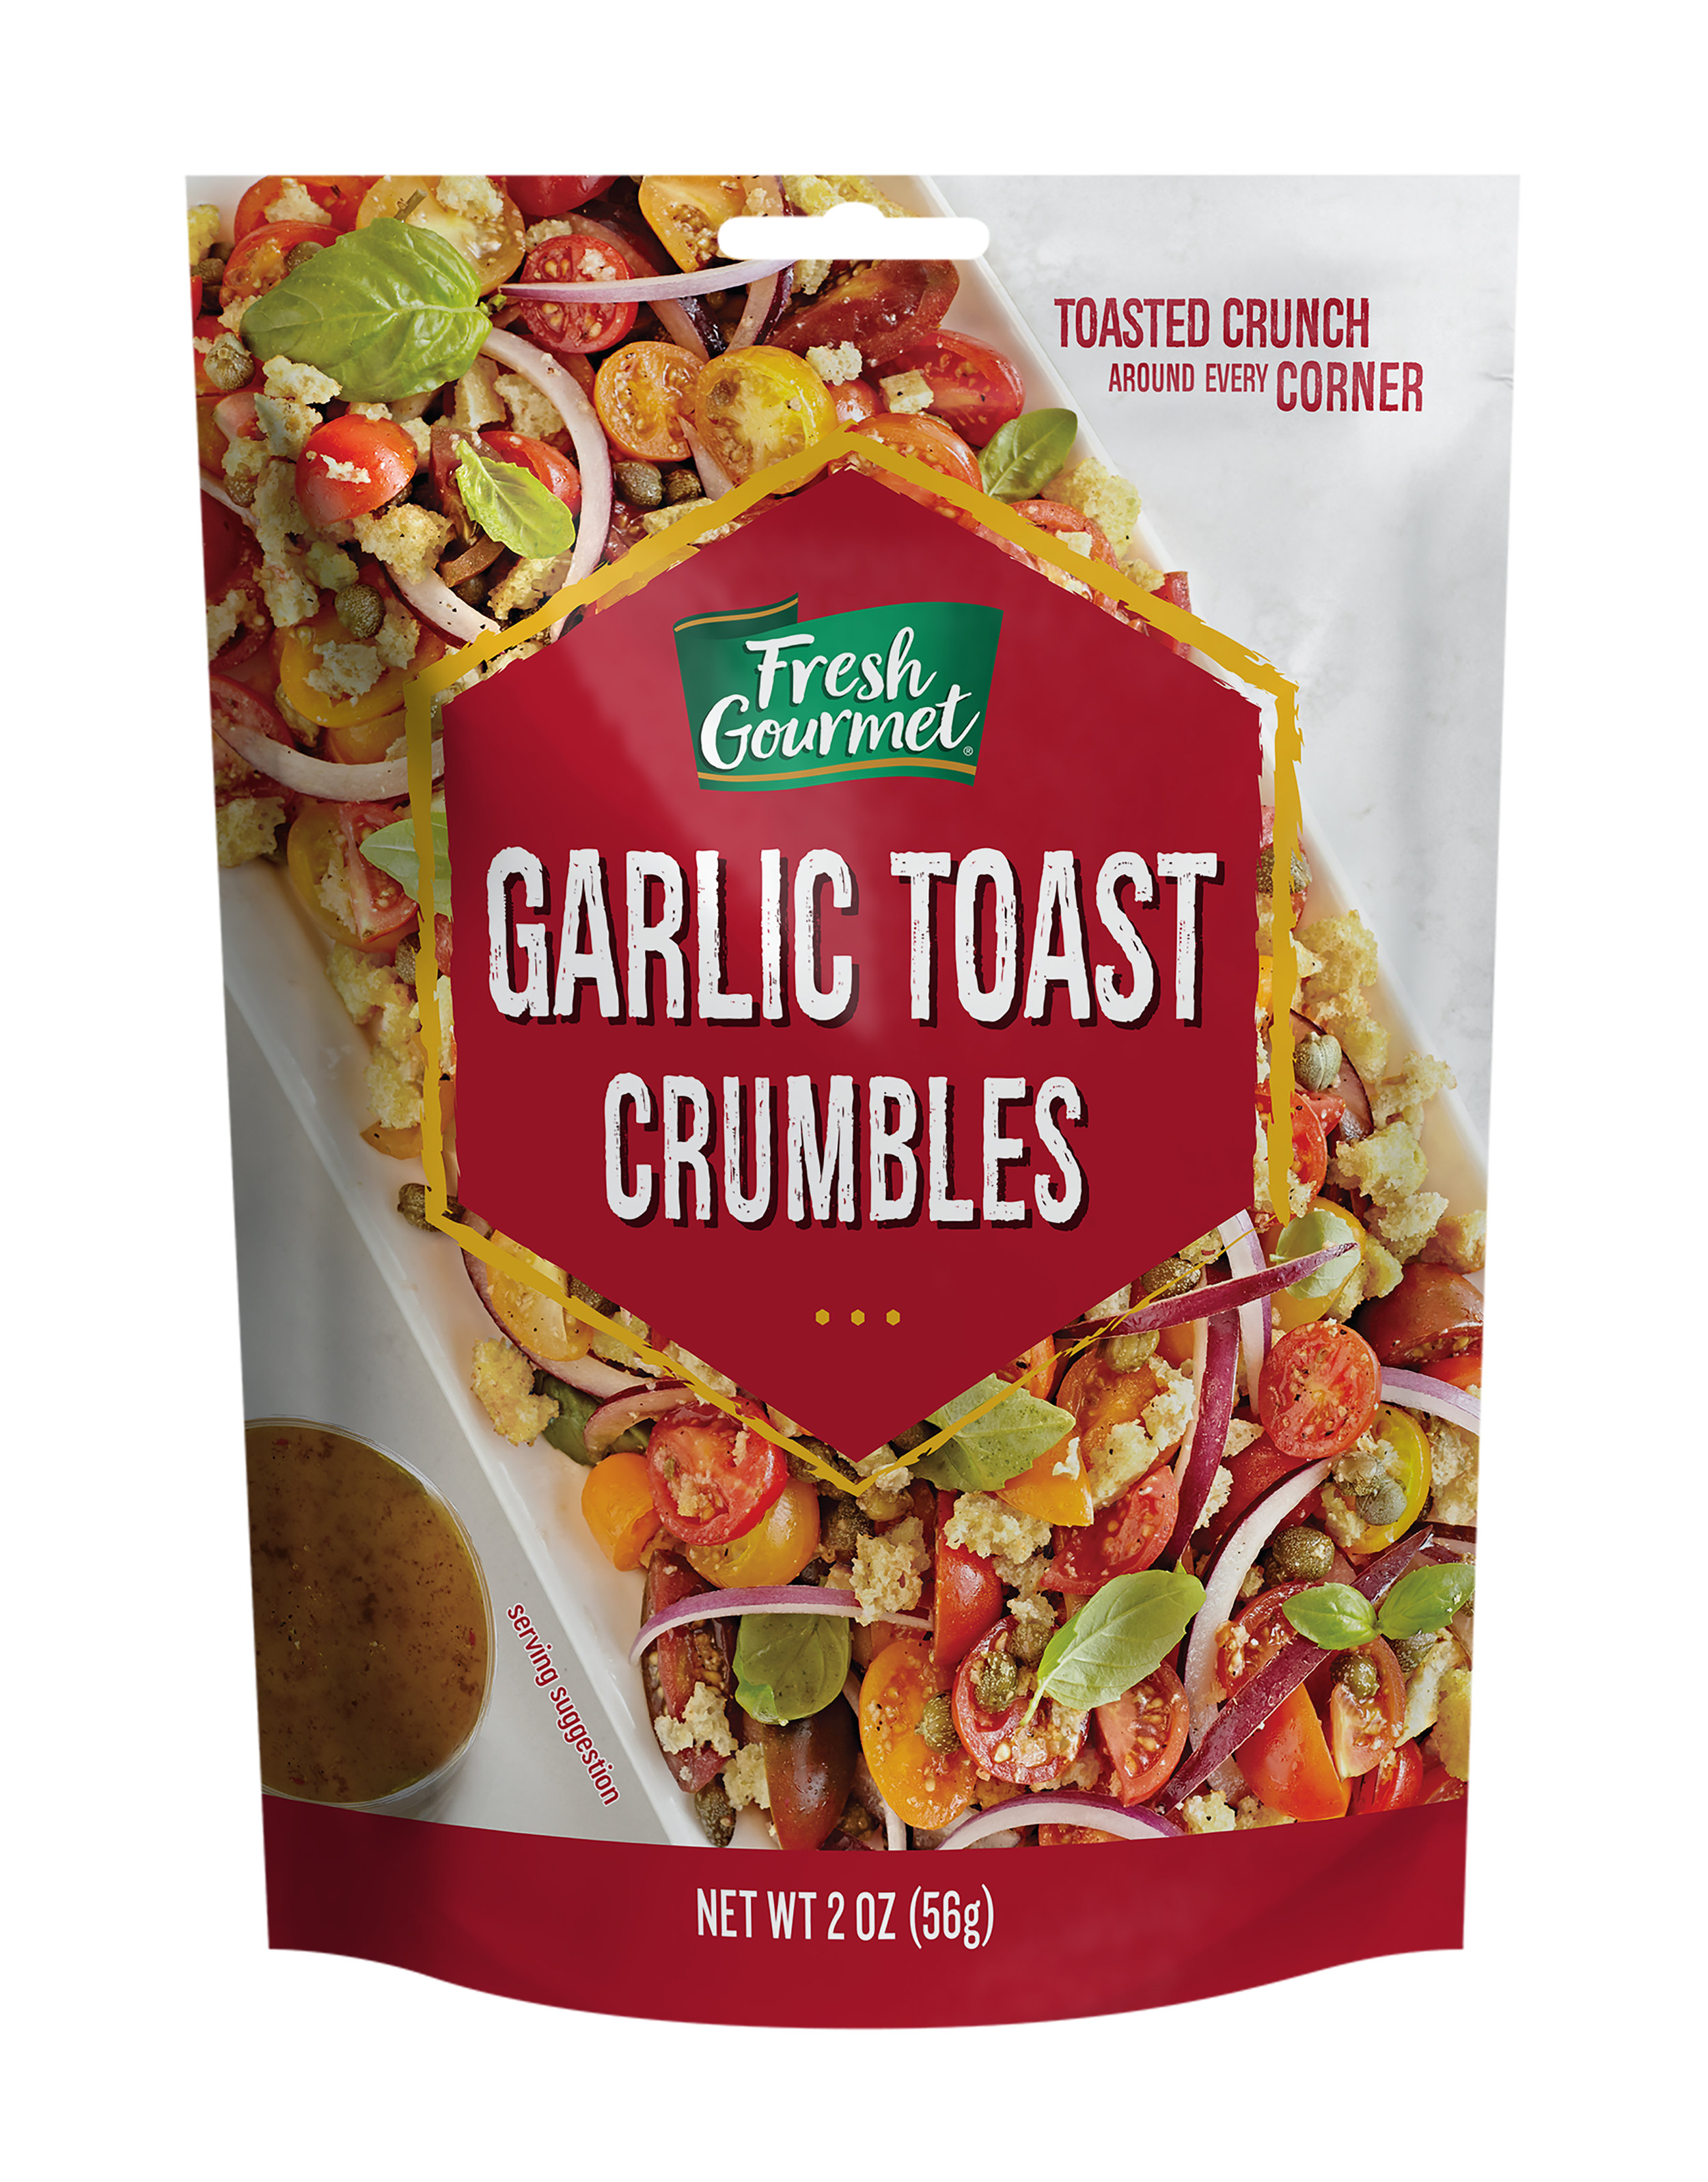 10472-FG-9-2-oz-WALMART-Garlic-Toast-Crumbles-FRONT.jpg